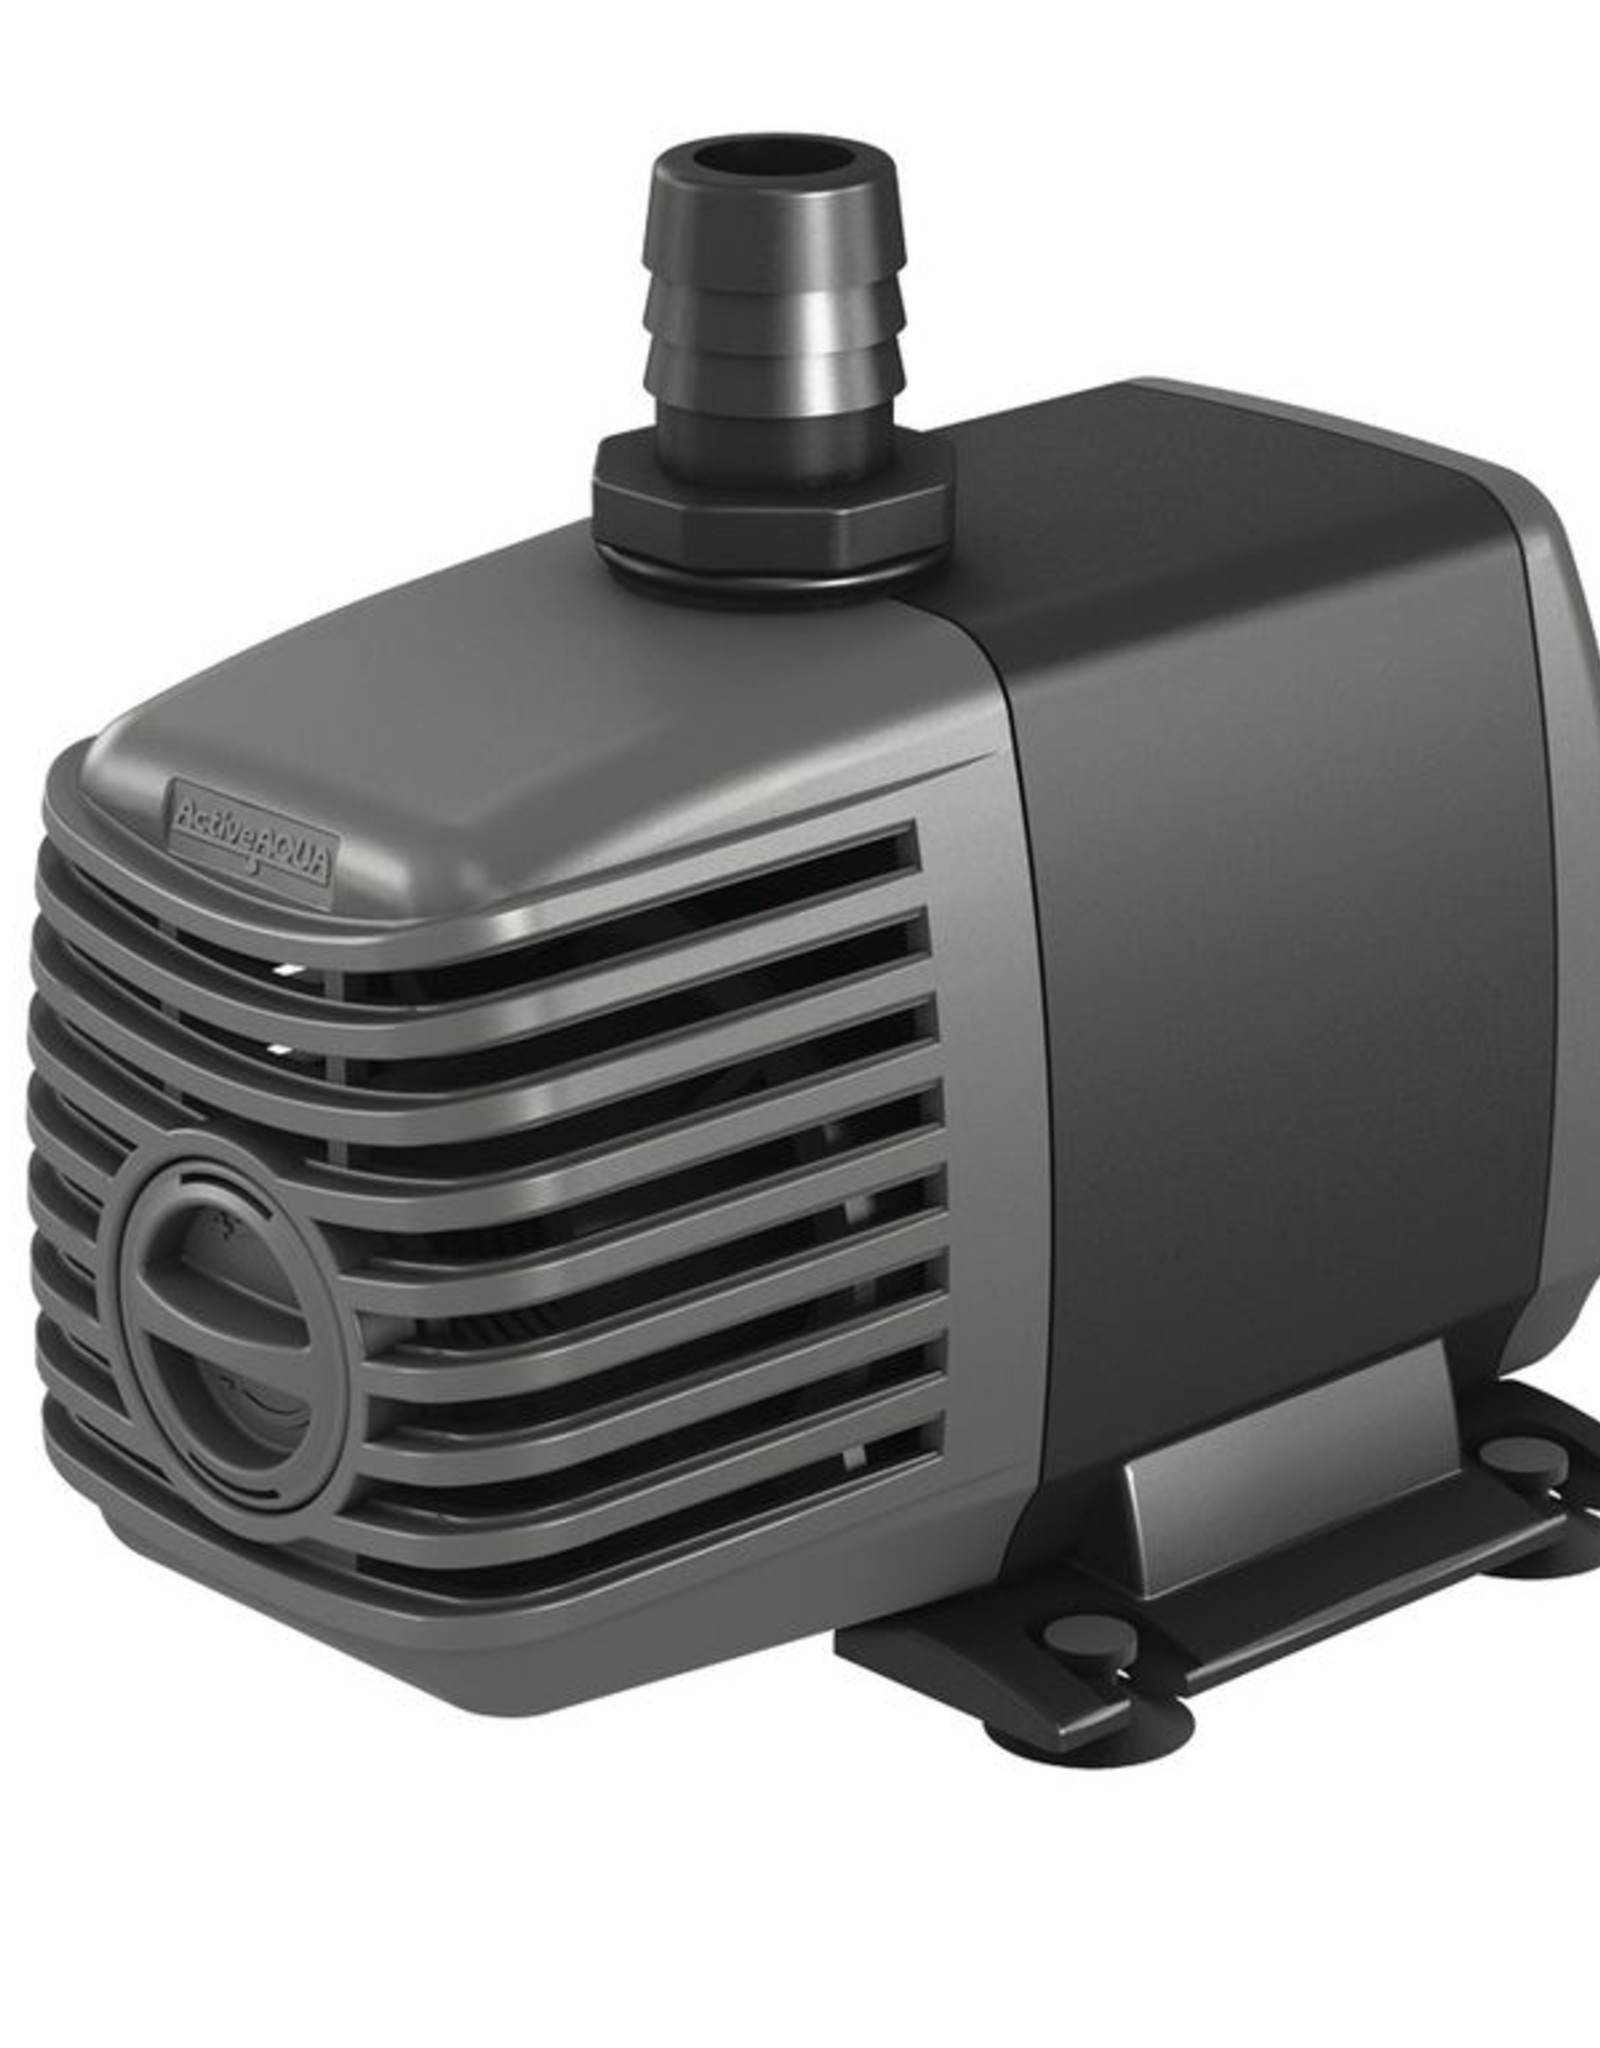 Active Aqua Submersible Water Pump, 250 GPH